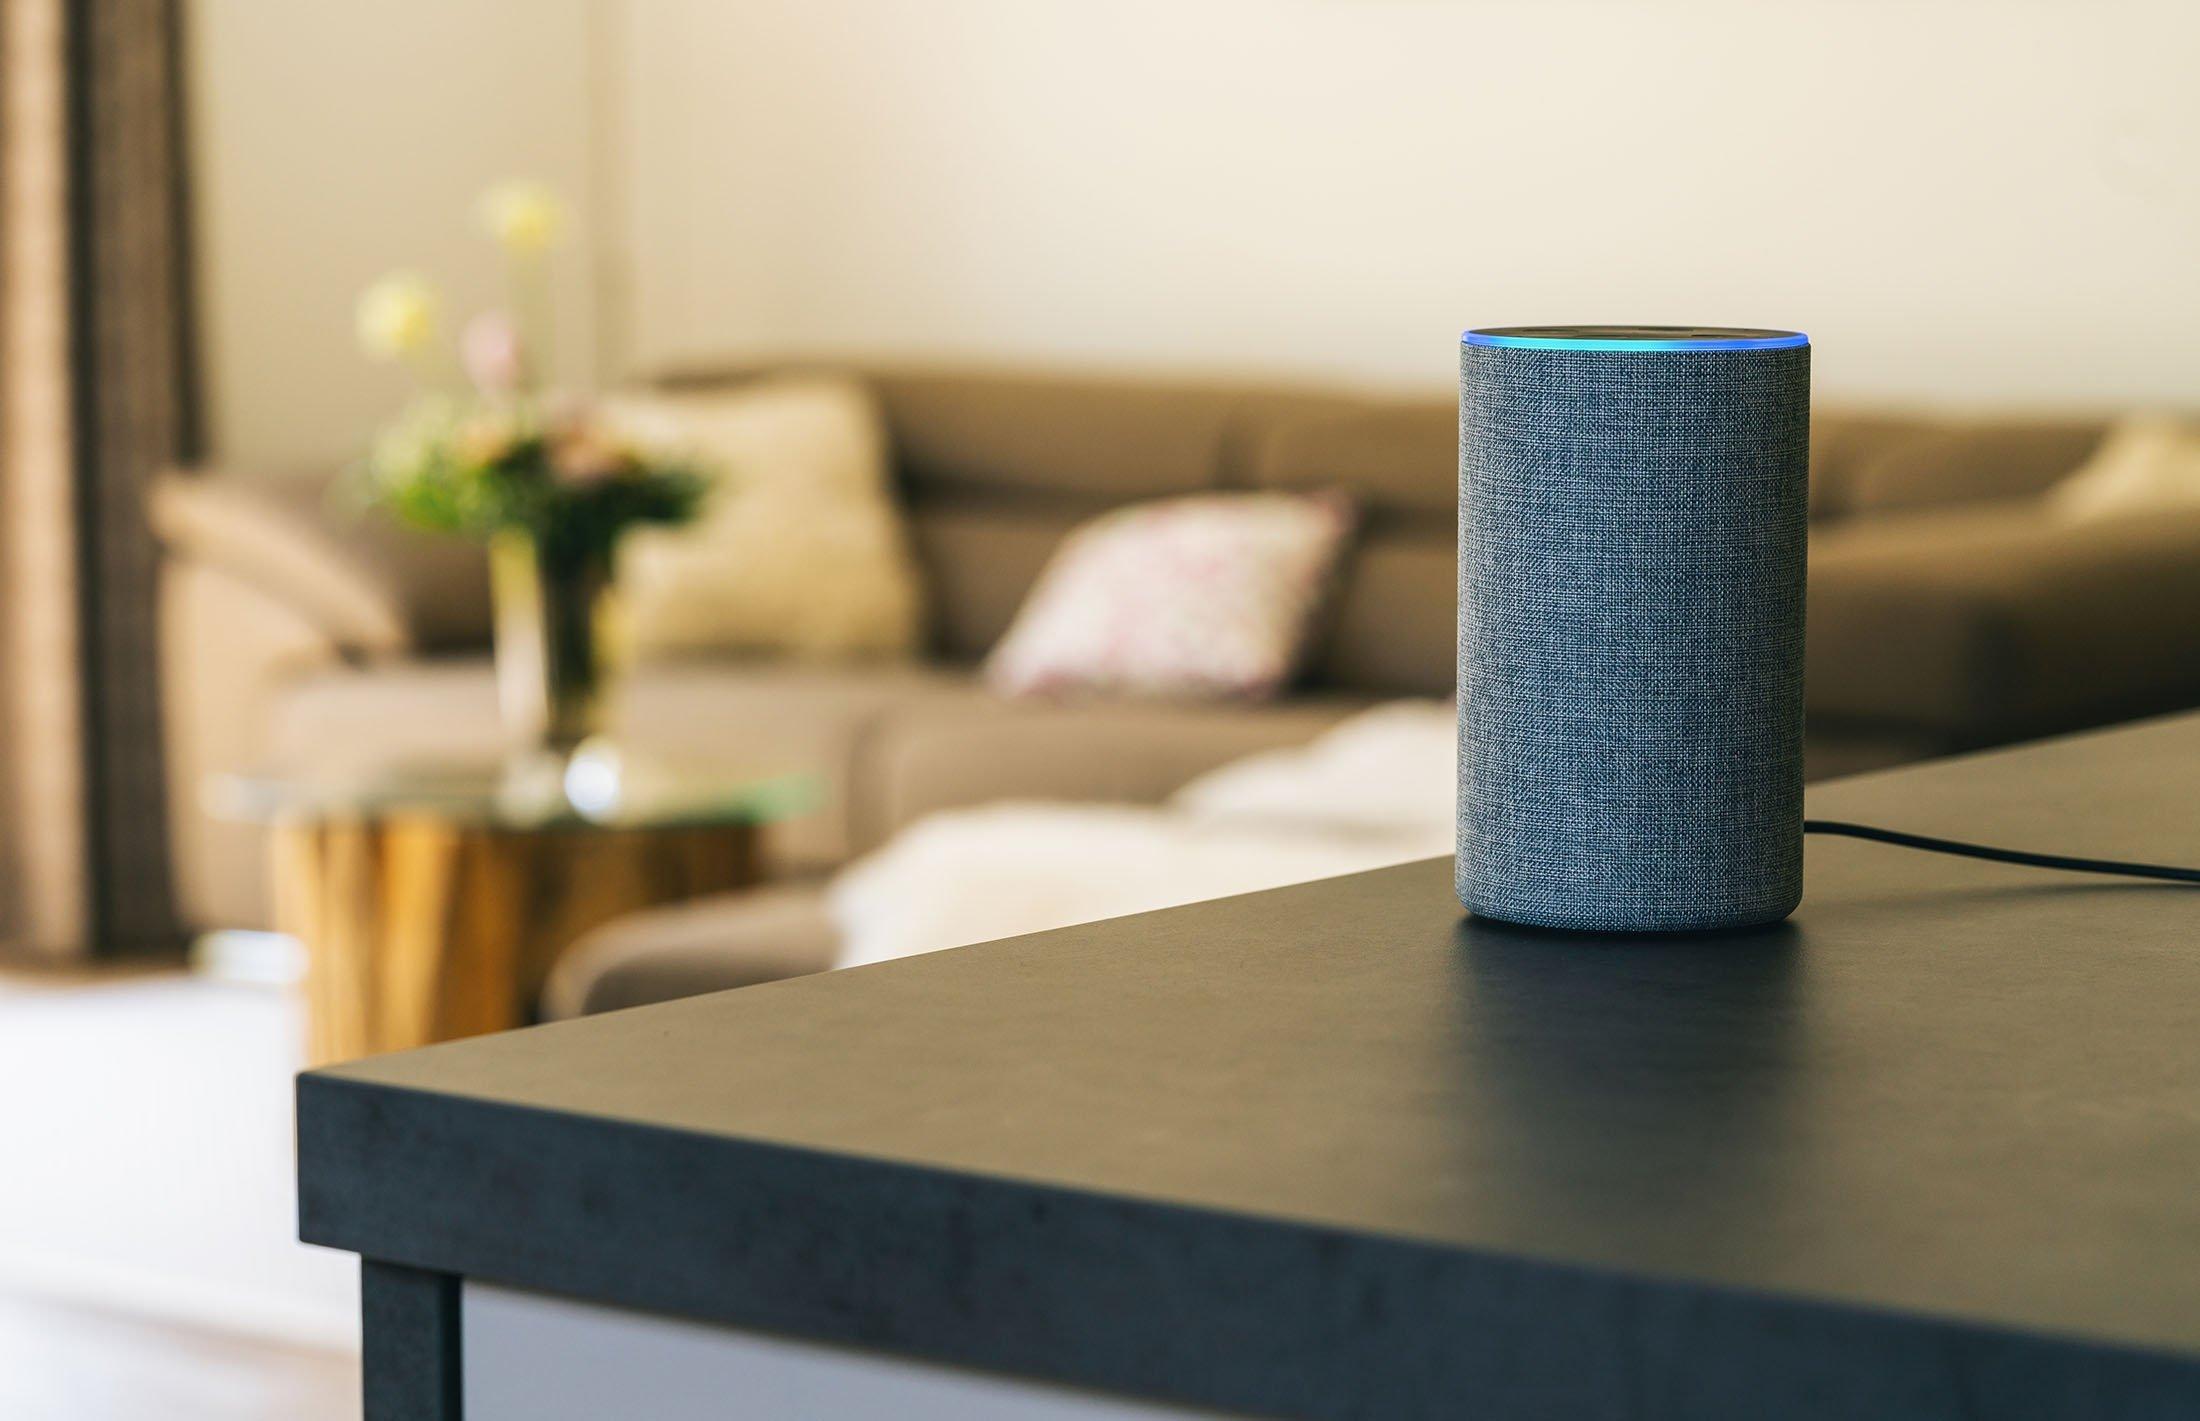 Amazon Echo. (Shutterstock Photo)